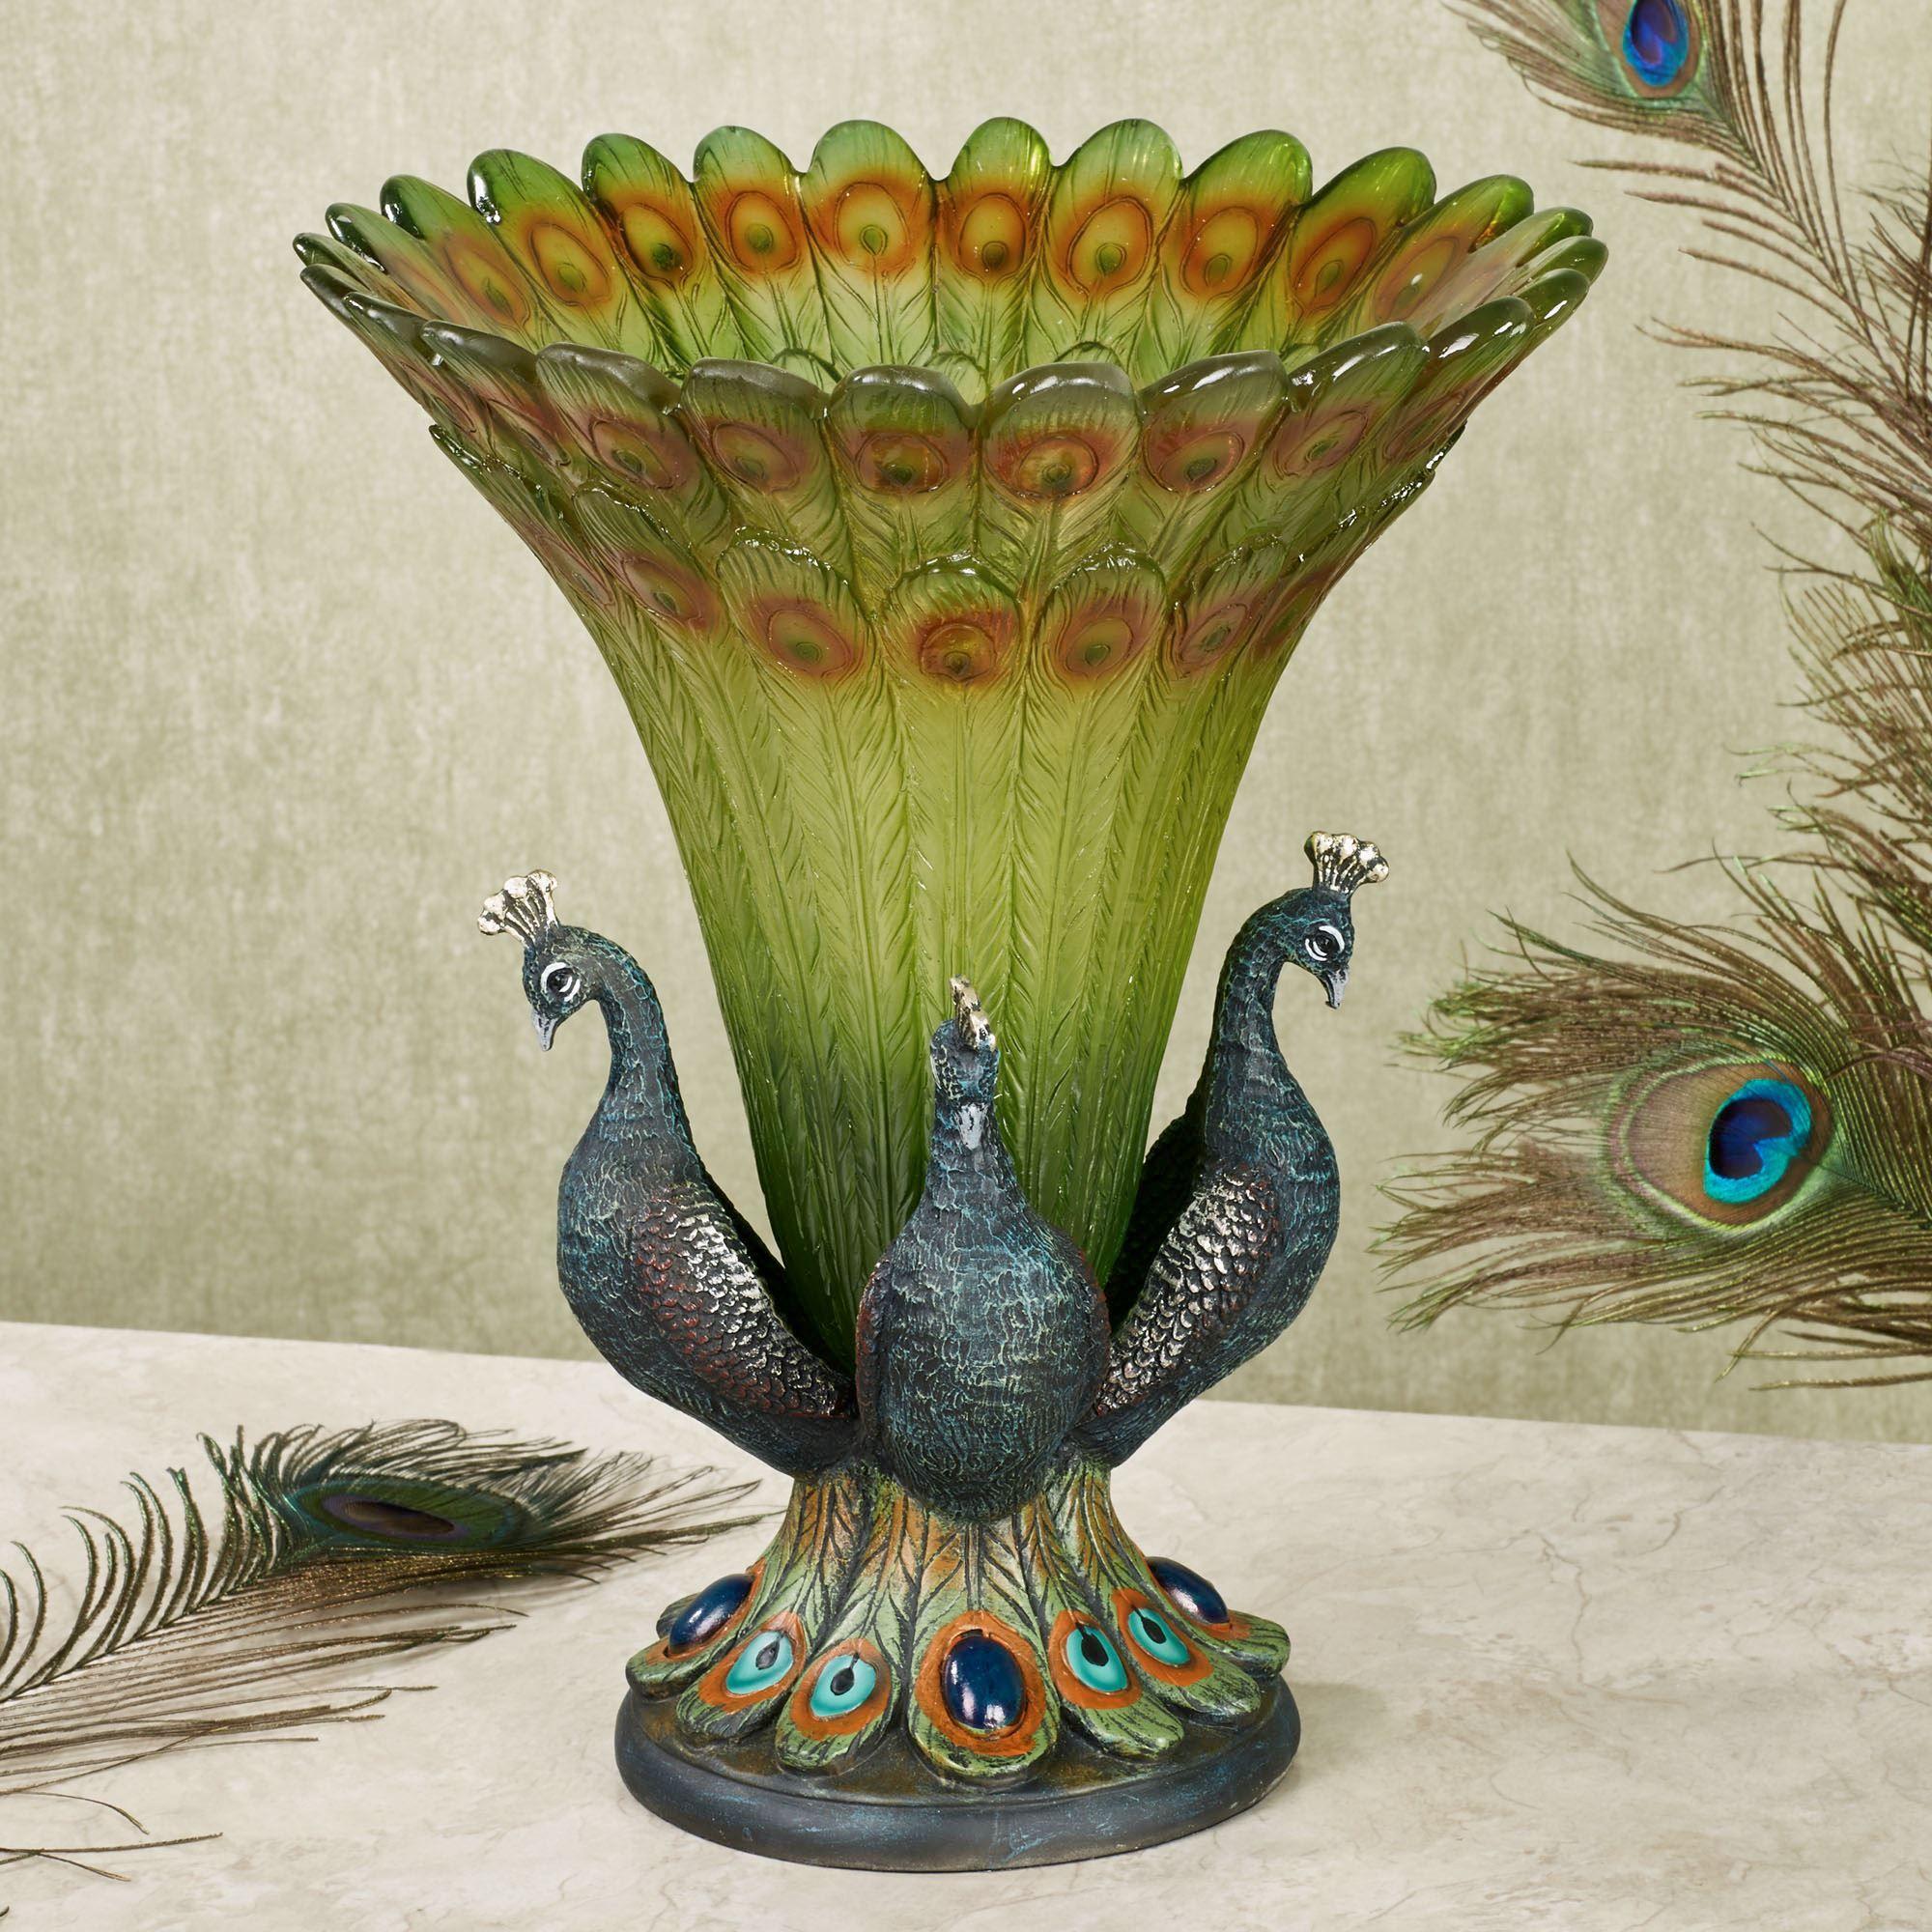 Peacock tabletop centerpiece vase